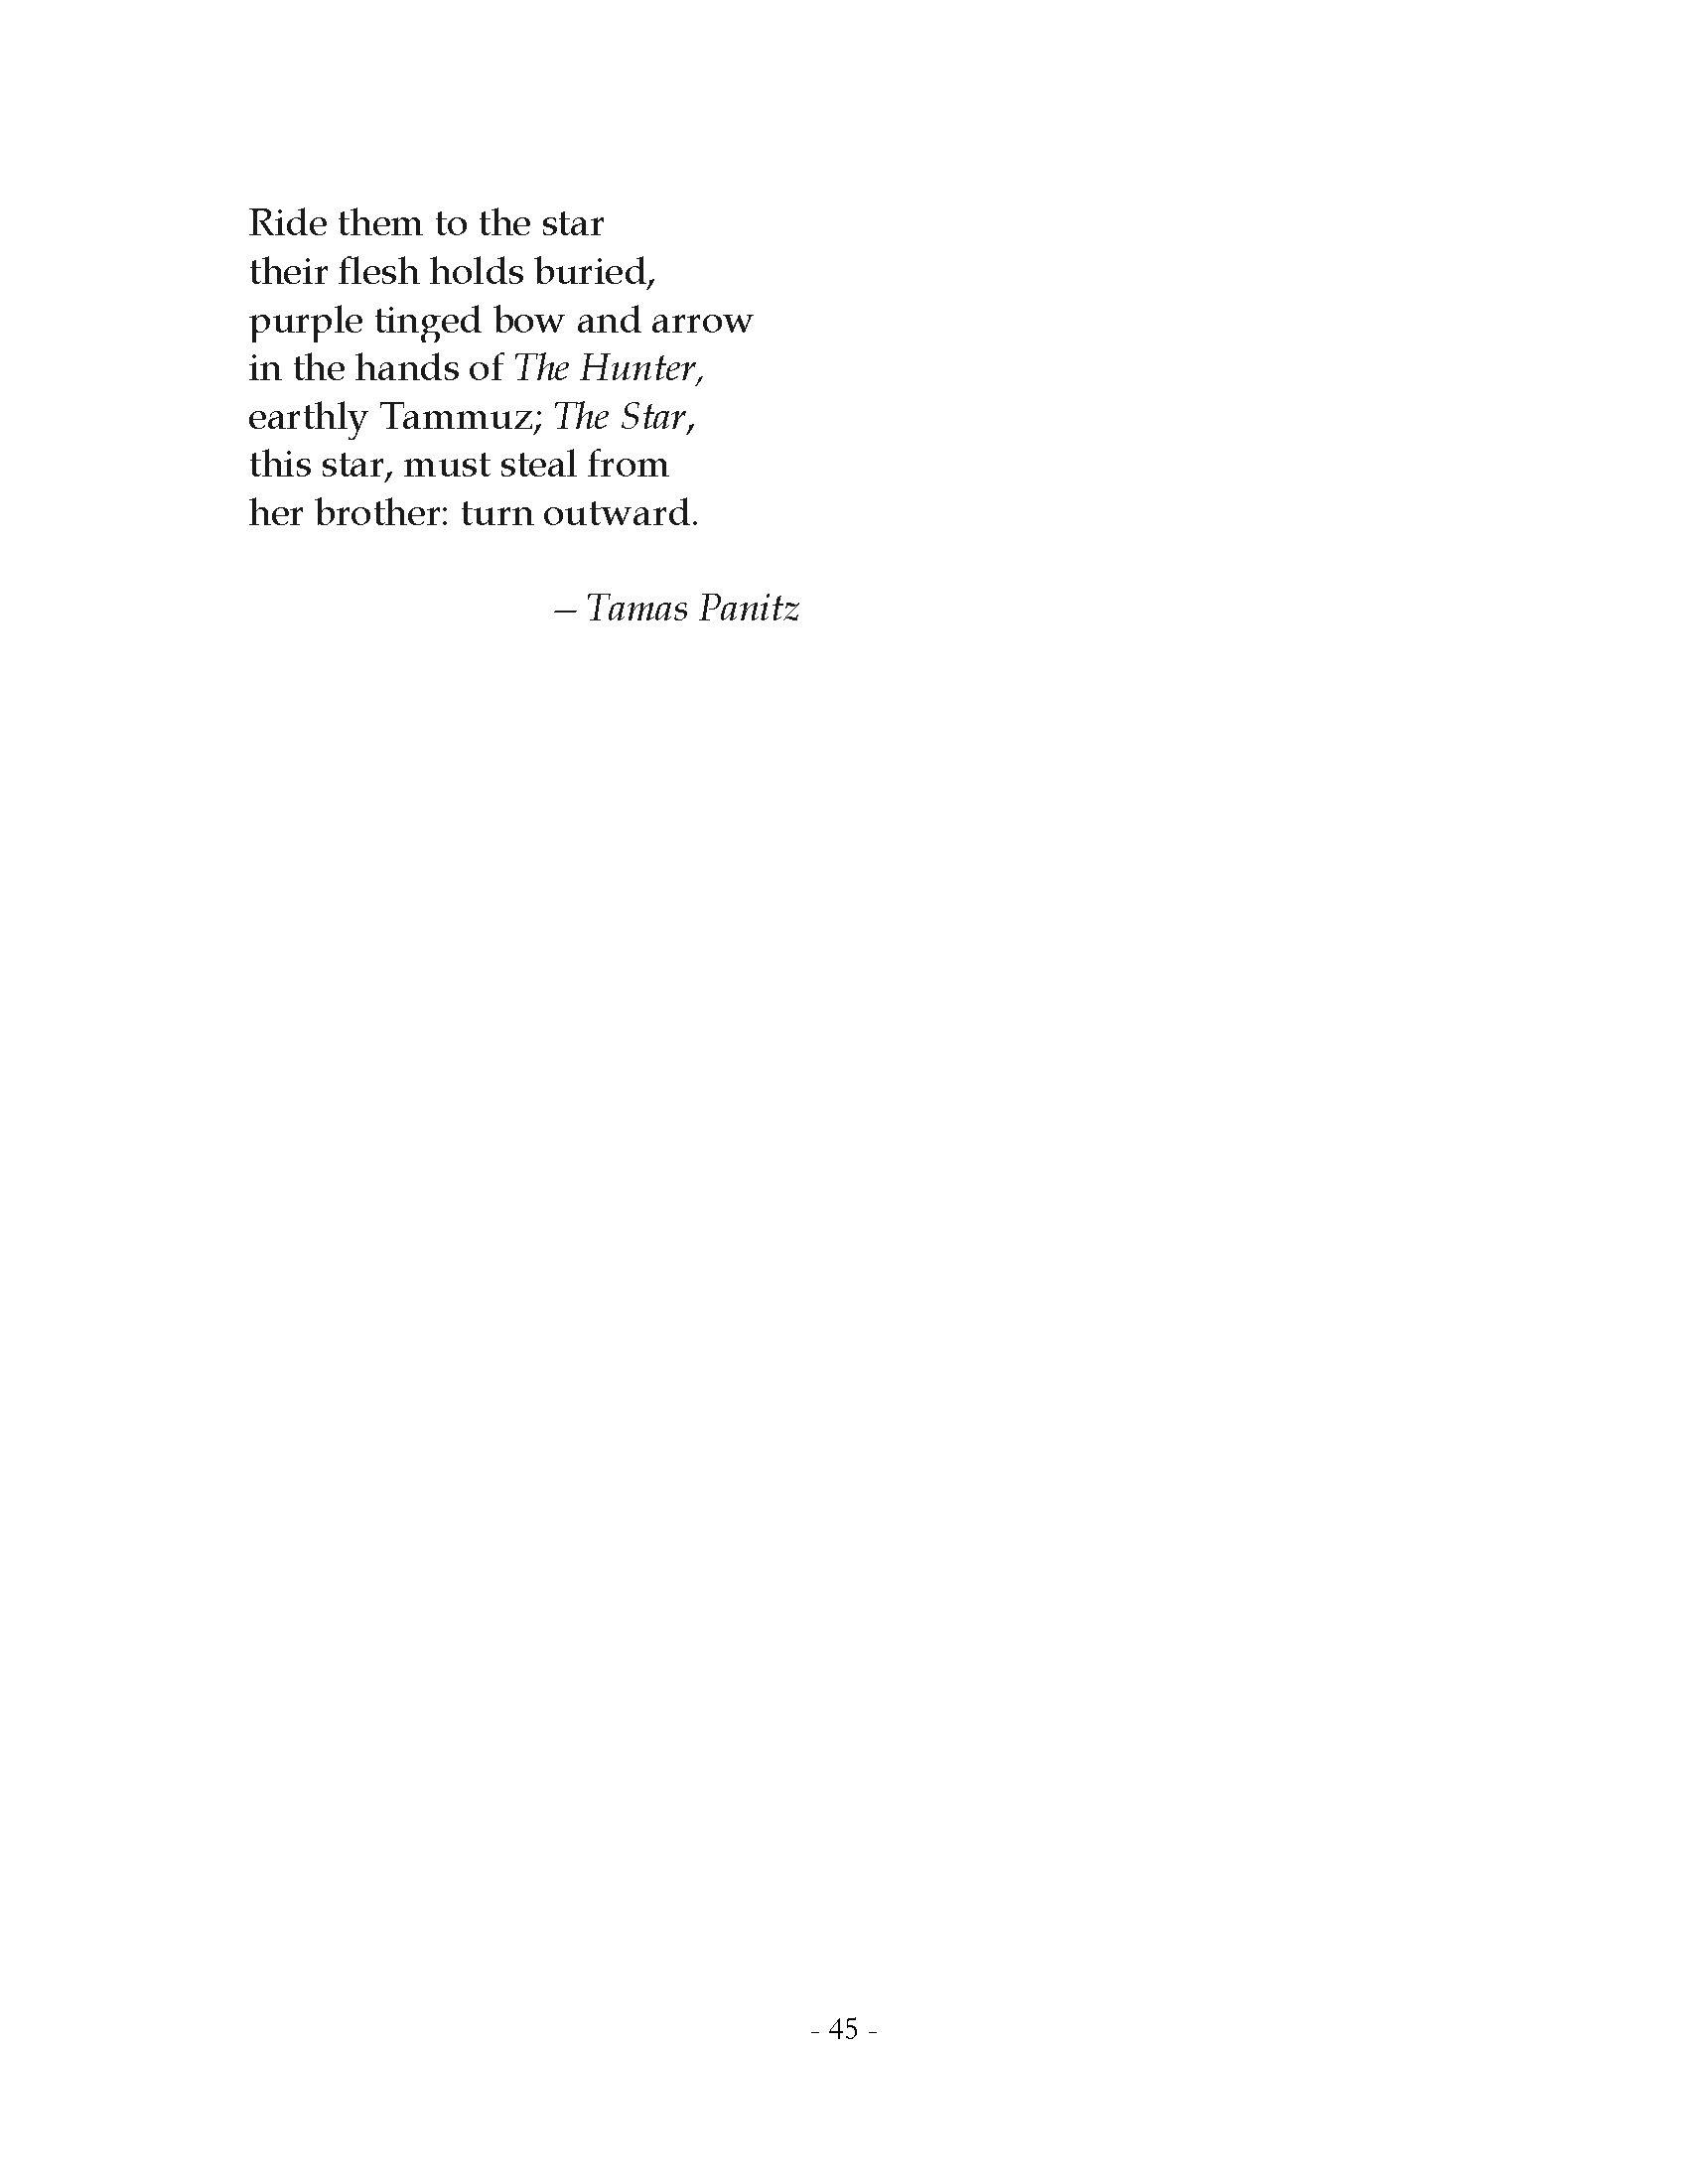 Tamas Panitz Page 45 Published by  Metambesen  Annandale-on-Hudson, 2019